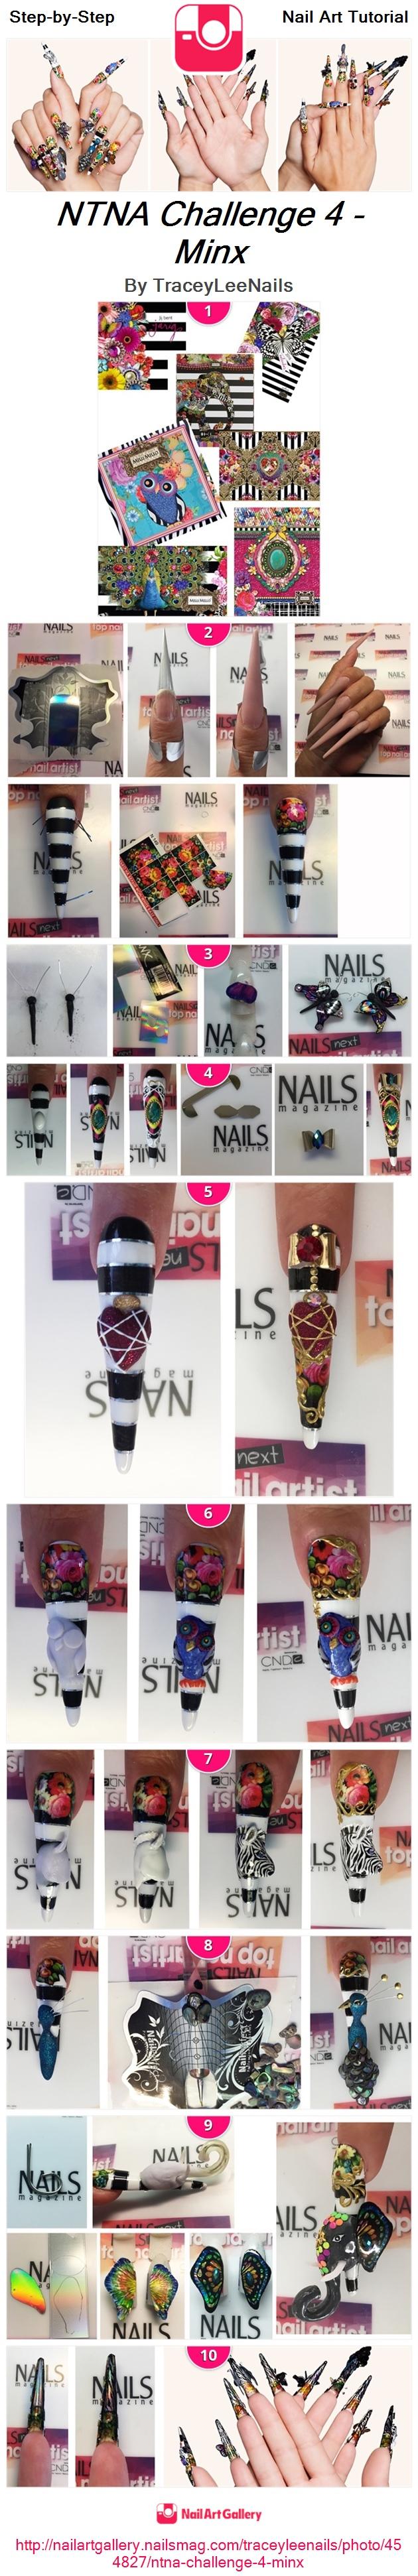 NTNA Challenge 4 - Minx - Nail Art Gallery